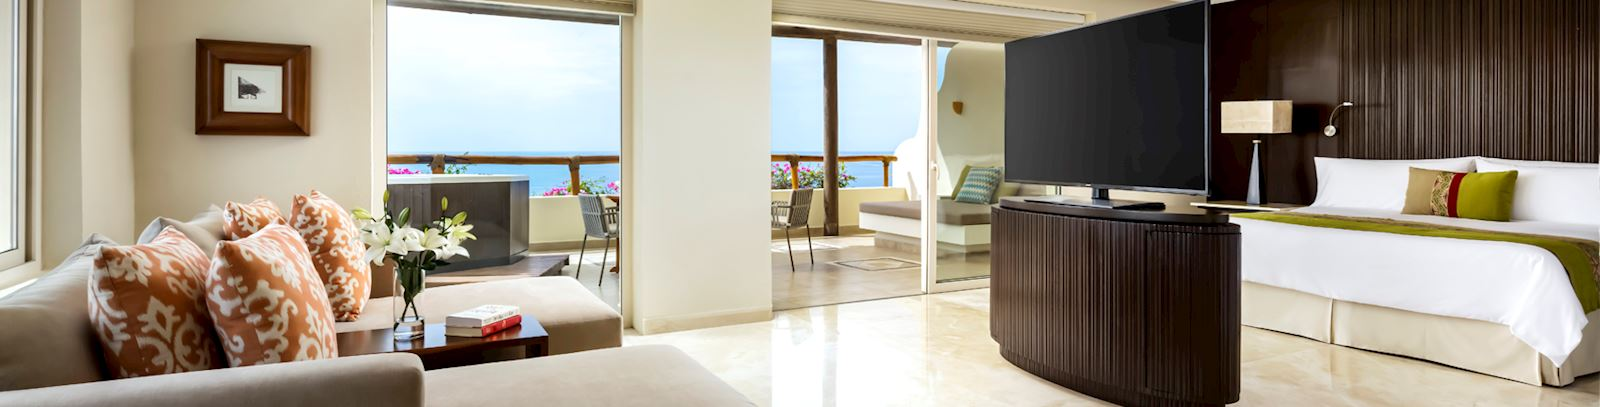 Suite Ambassador Grand Class en Grand Velas Riviera Nayarit